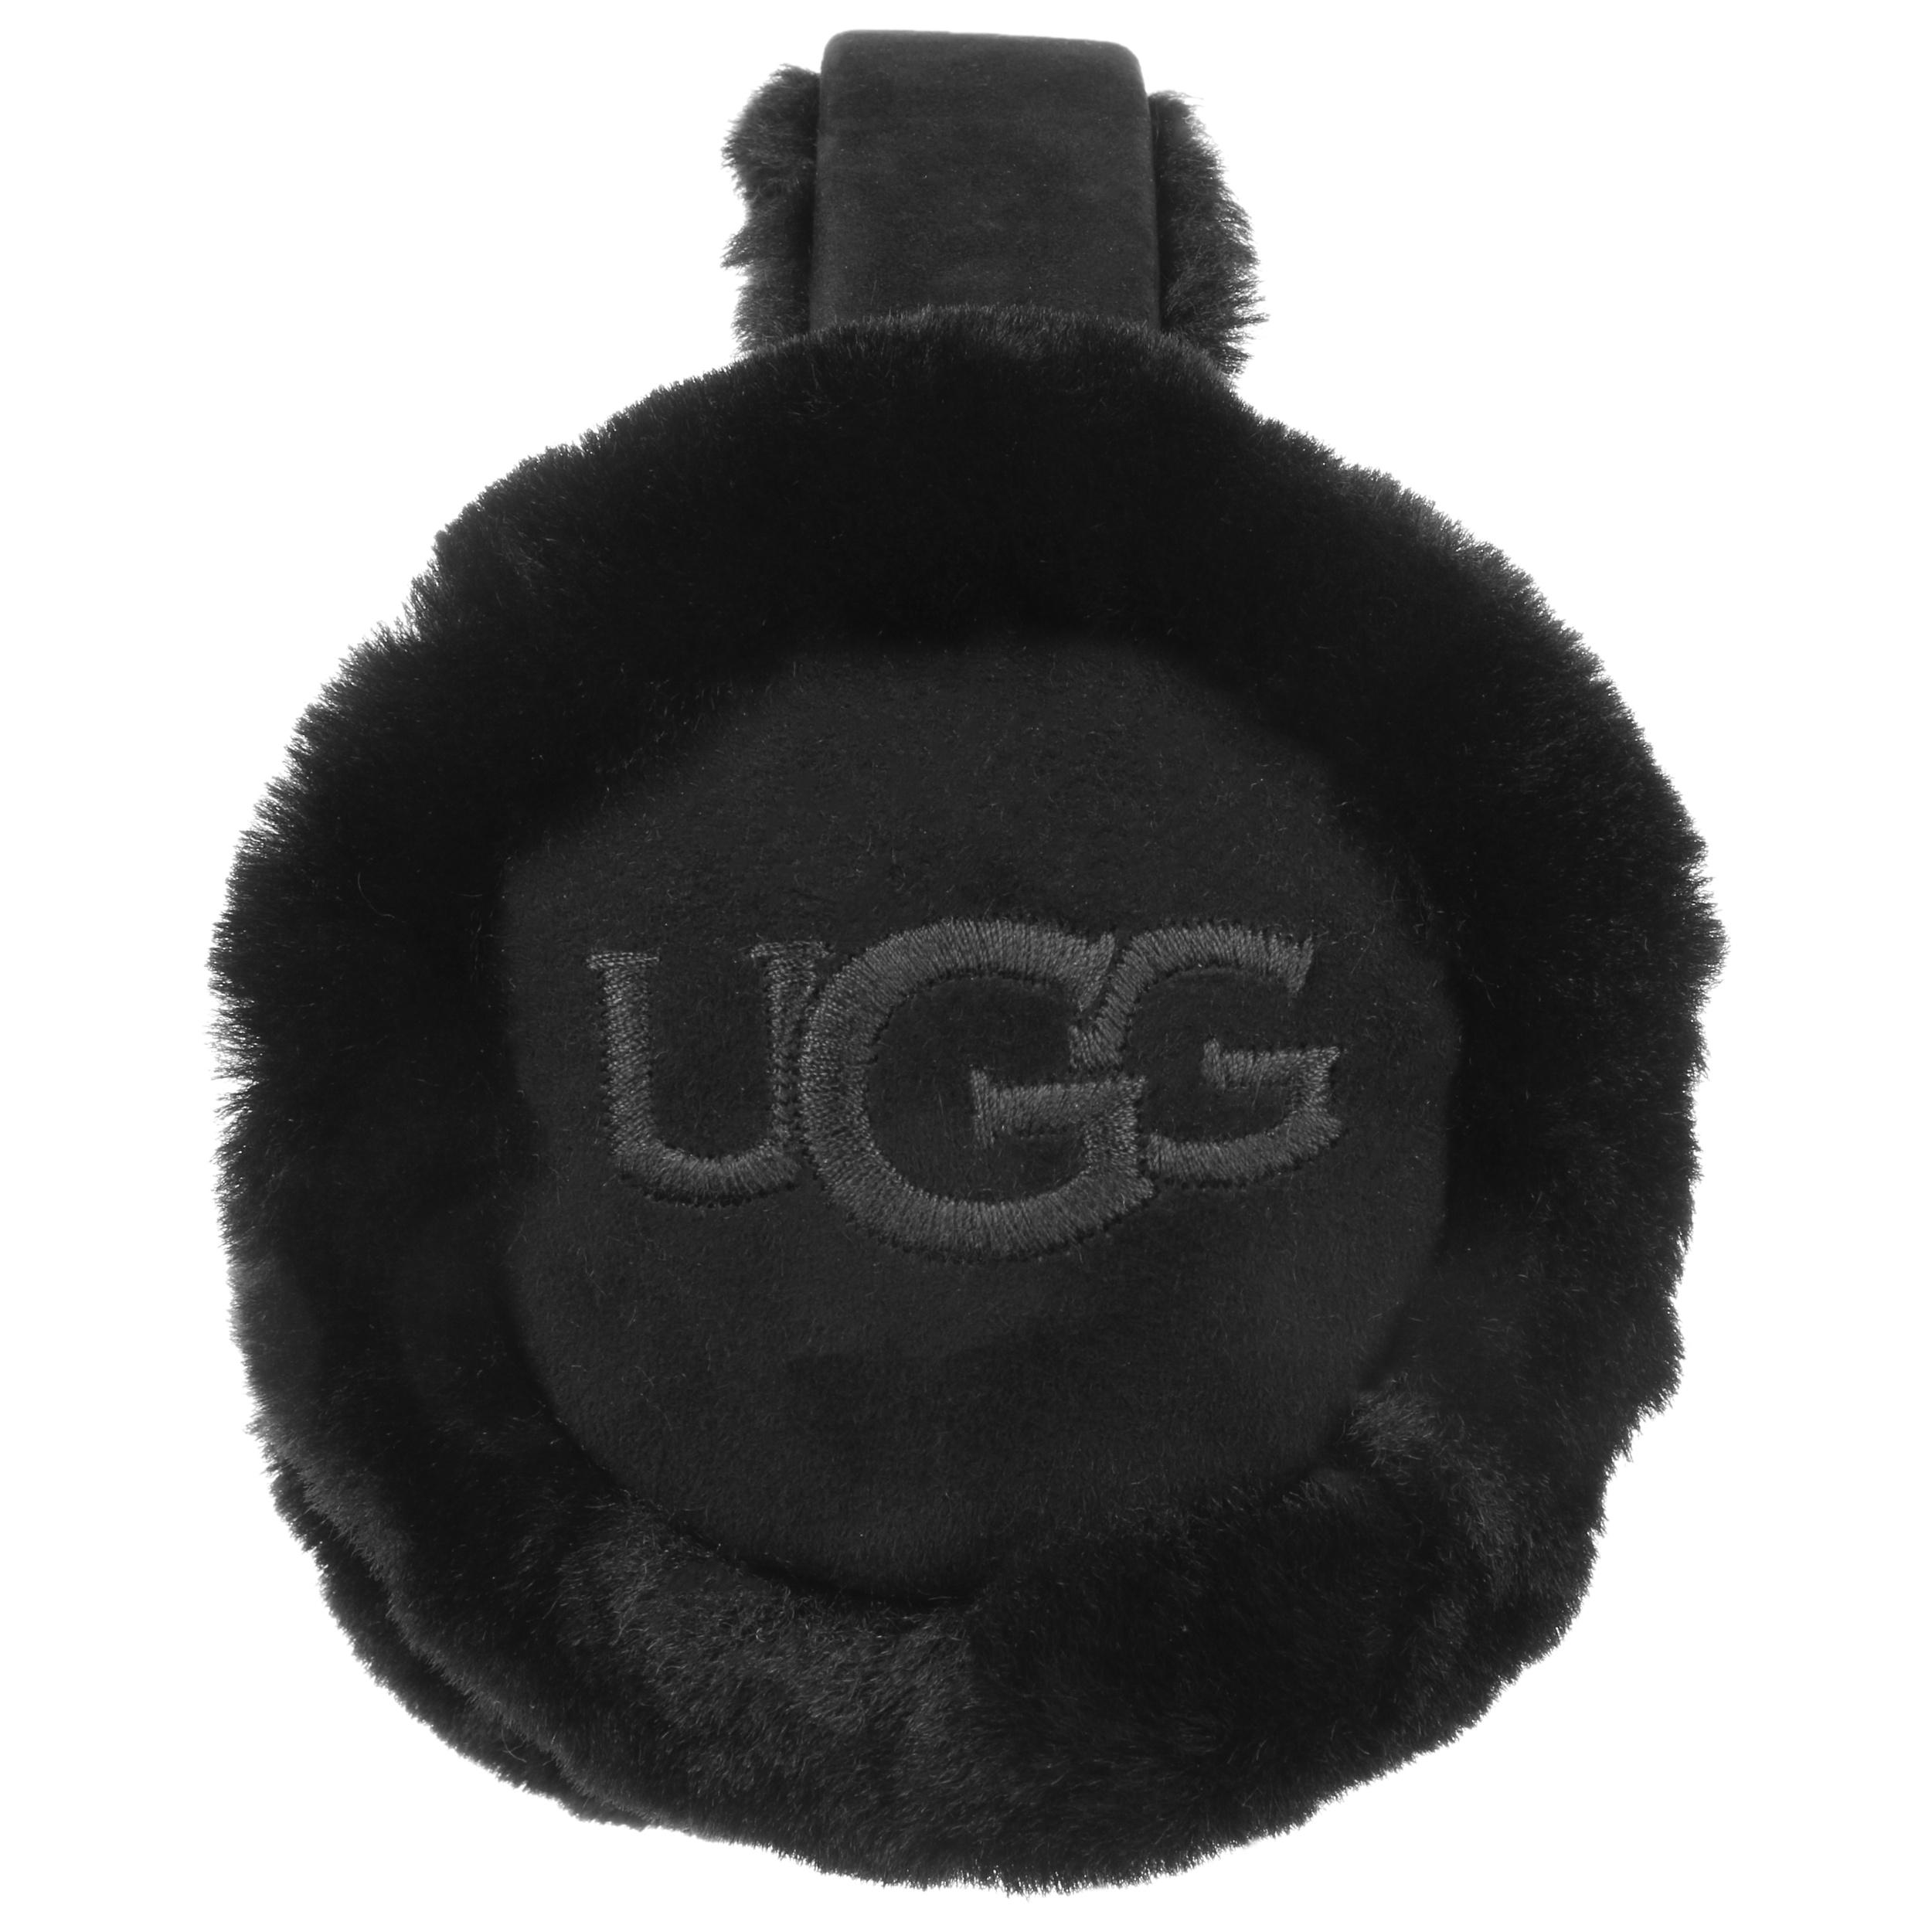 Classic Sheepskin Ear Warmers by UGG